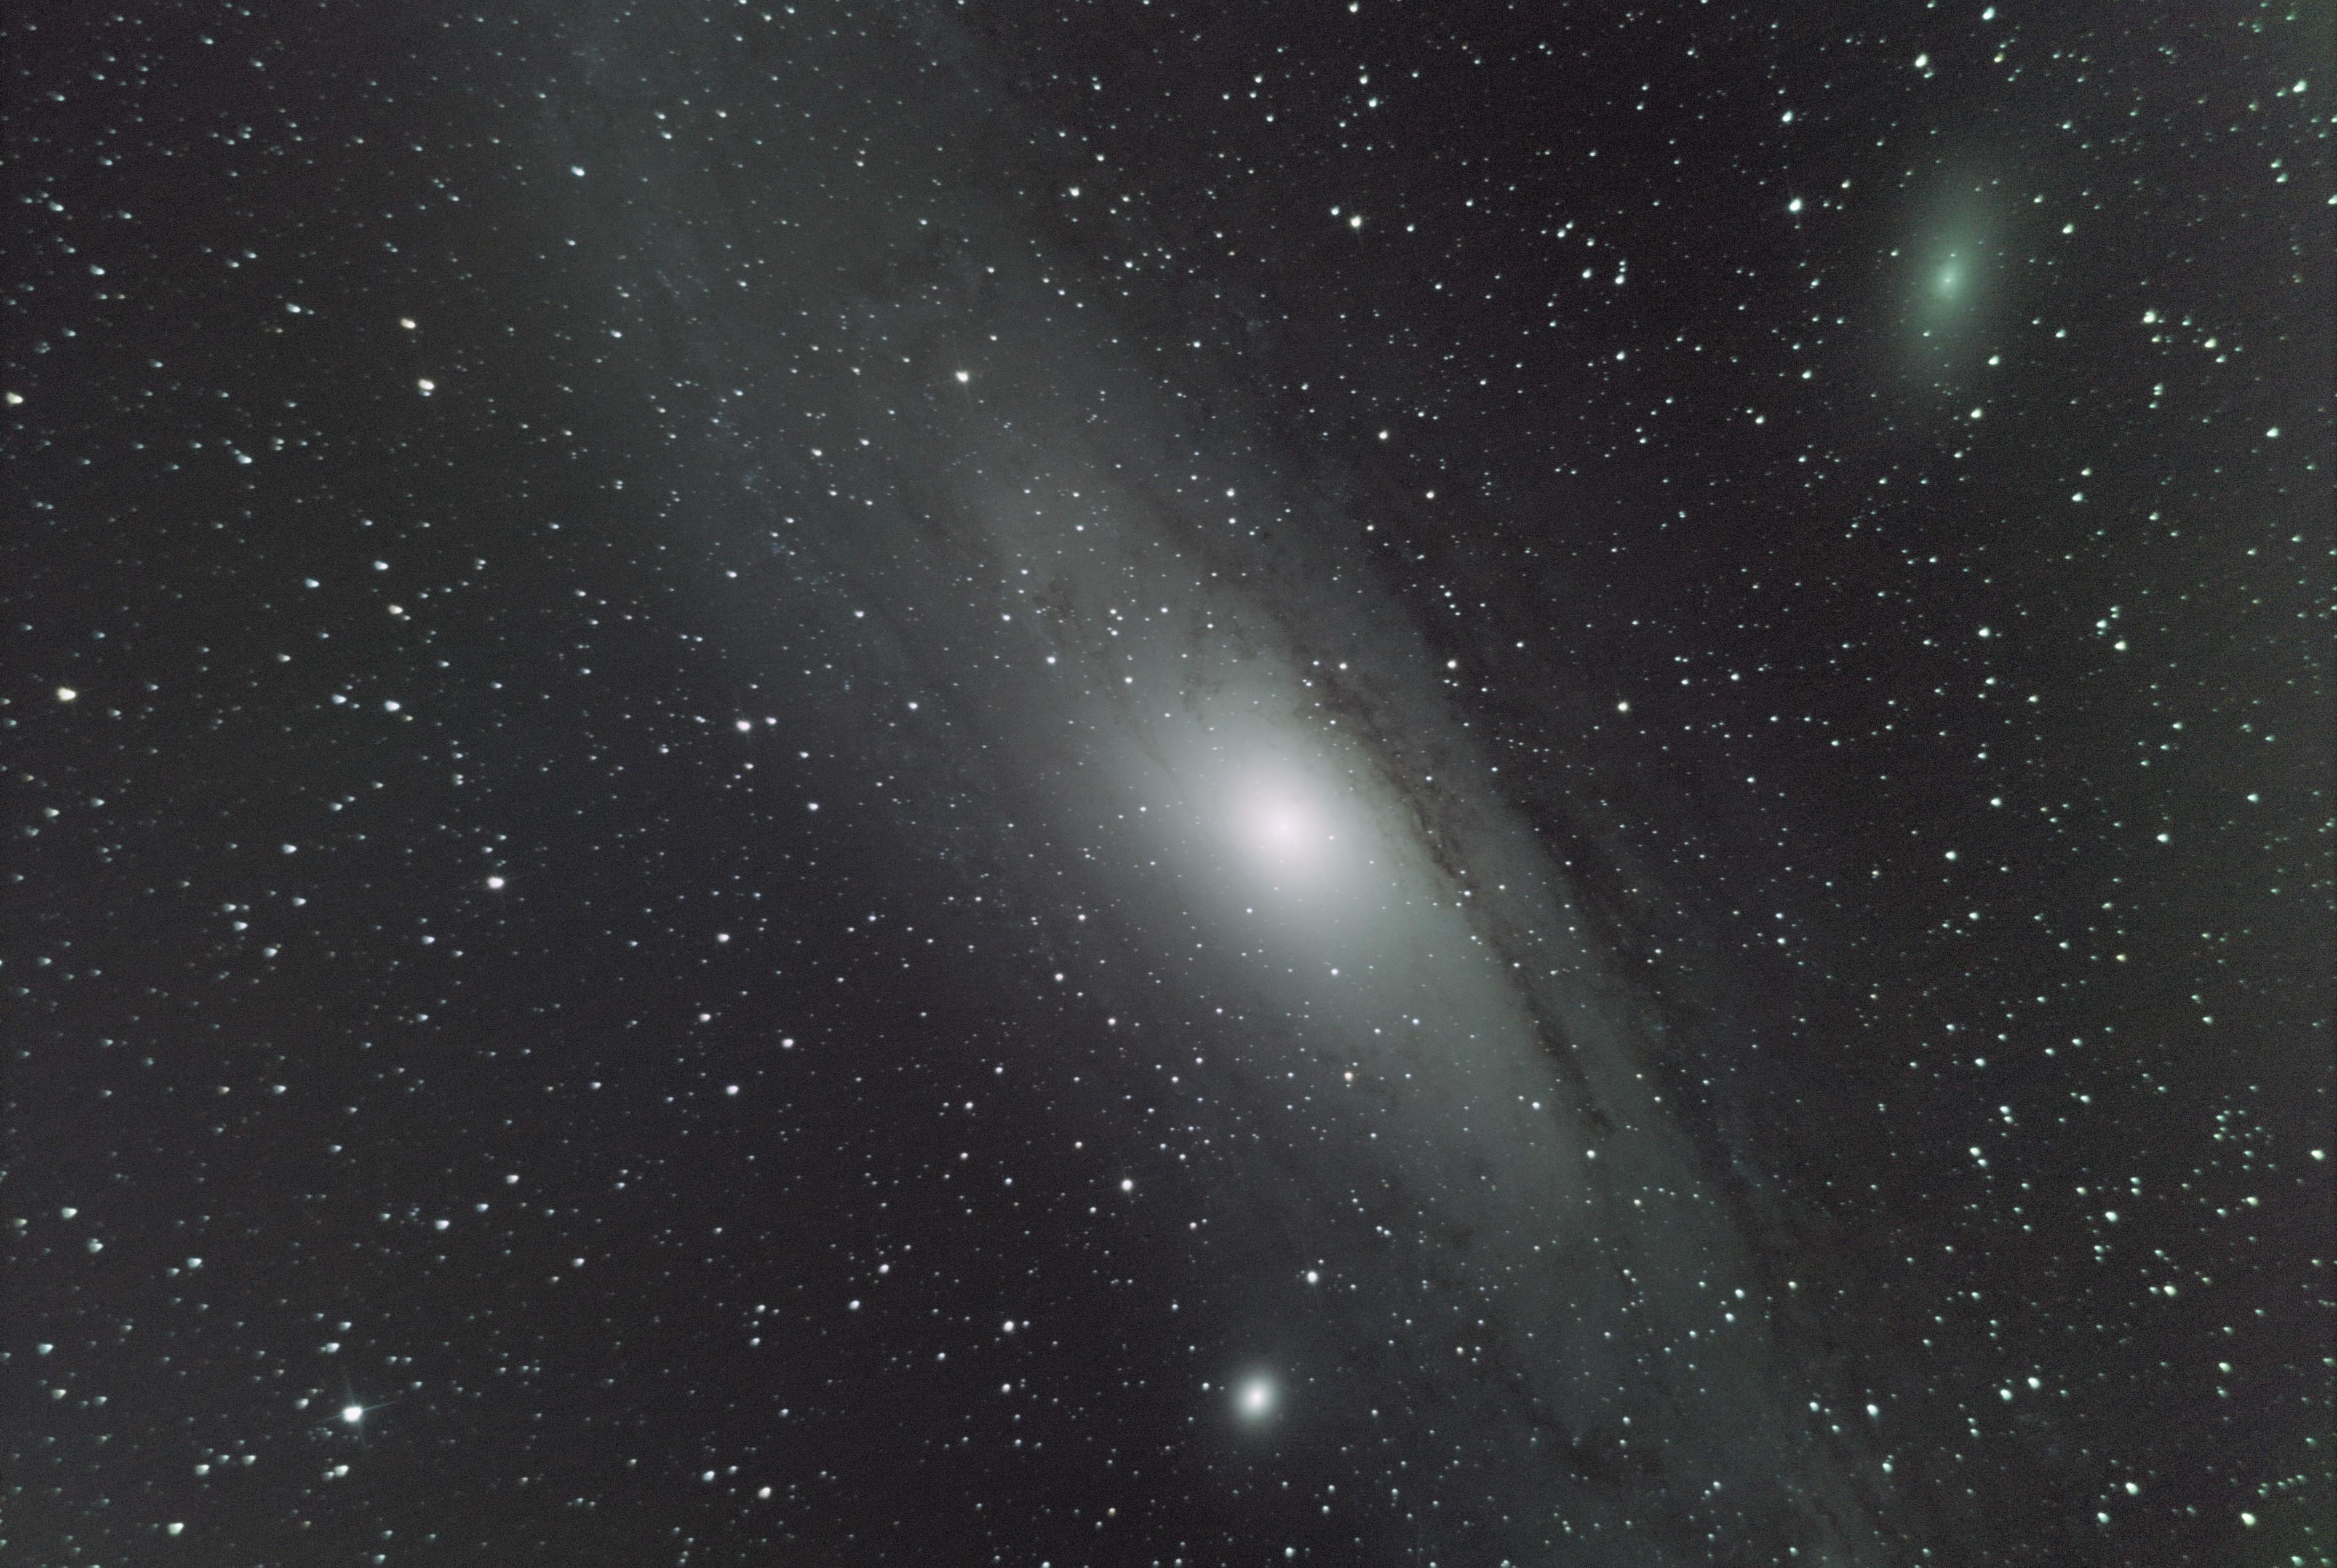 M31 Galaxie d'Andromède M31-0050G0080R